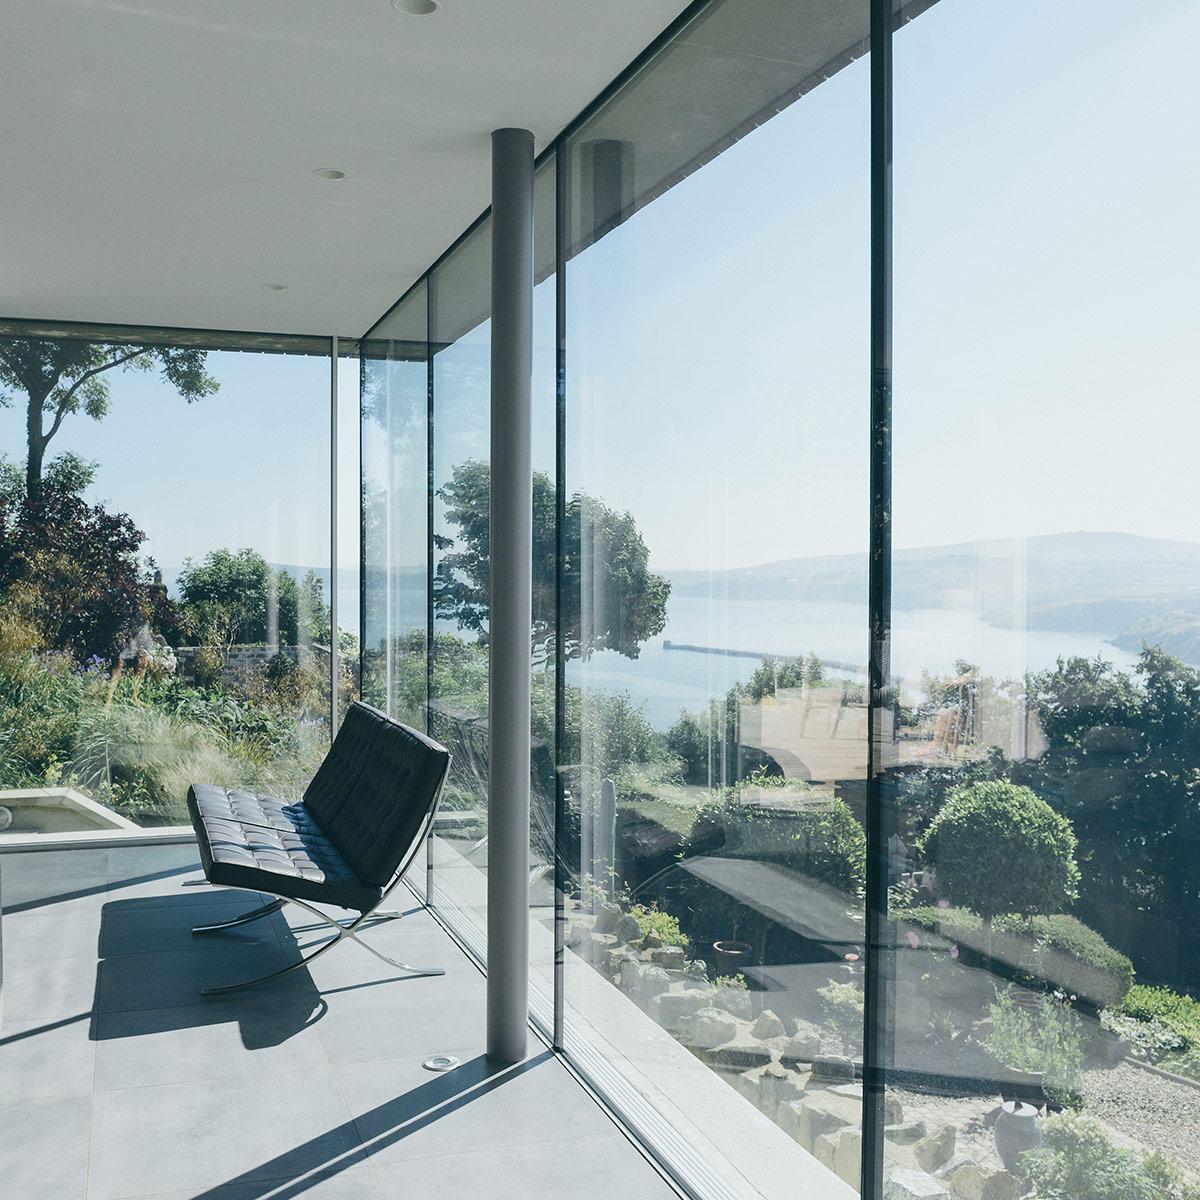 ralph-kent-architect-garden-pavilion-extension-renovation-victorian-terraced-house-living-room-2.jpg